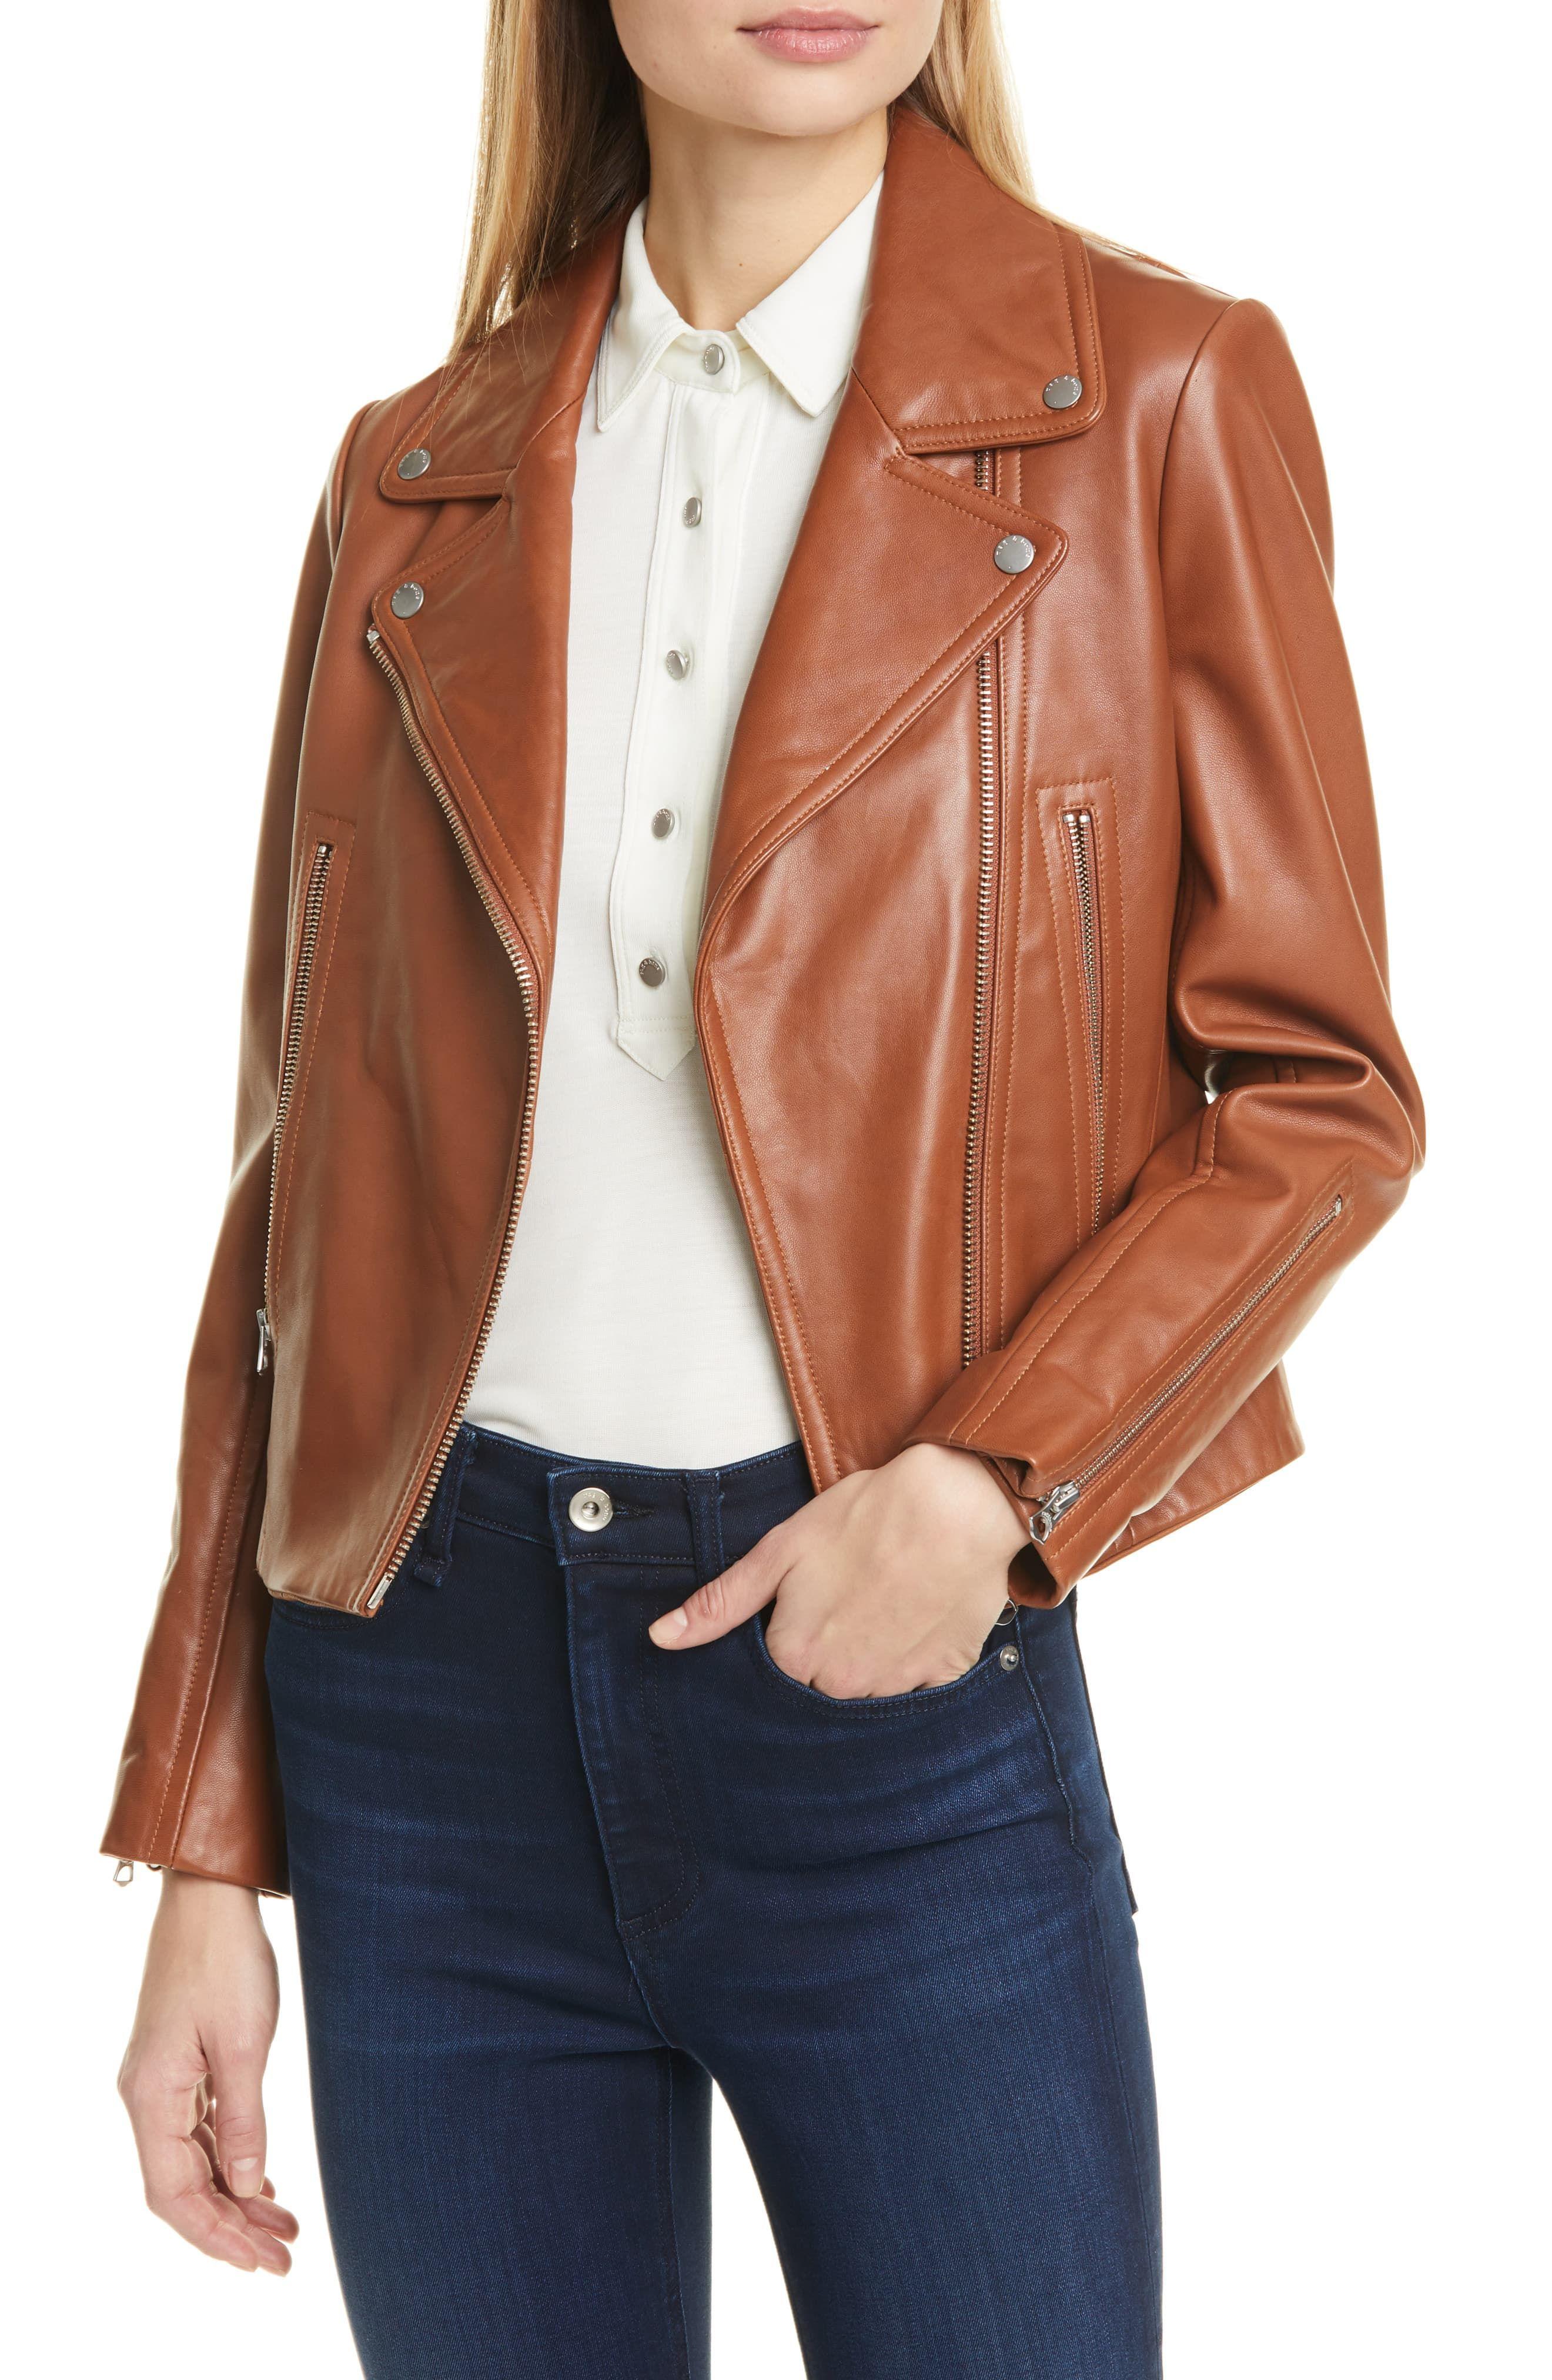 Rag Bone Mack Lambskin Leather Jacket Nordstrom Leather Jackets Women Lambskin Leather Jacket Leather Jacket Style [ 4048 x 2640 Pixel ]